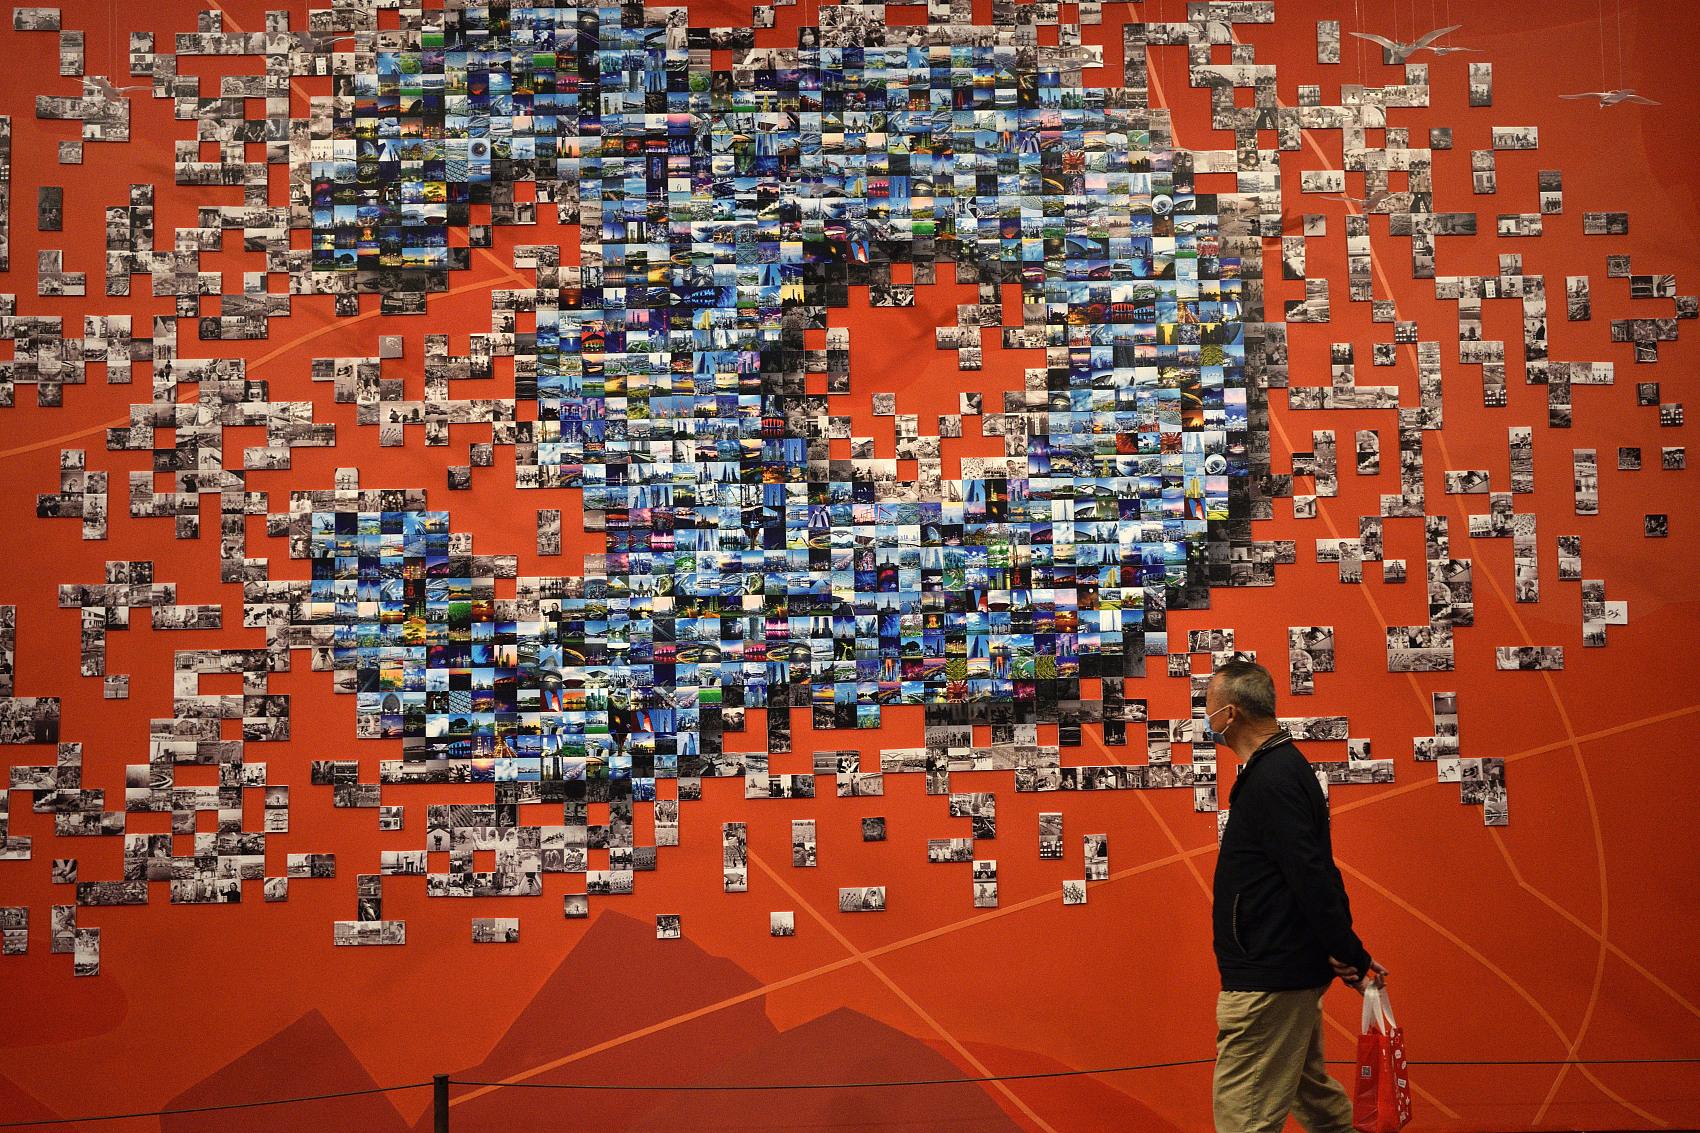 VCG111305108080觀眾在上海中華藝術宮觀看浦東開發開放30周年藝術展。.jpg